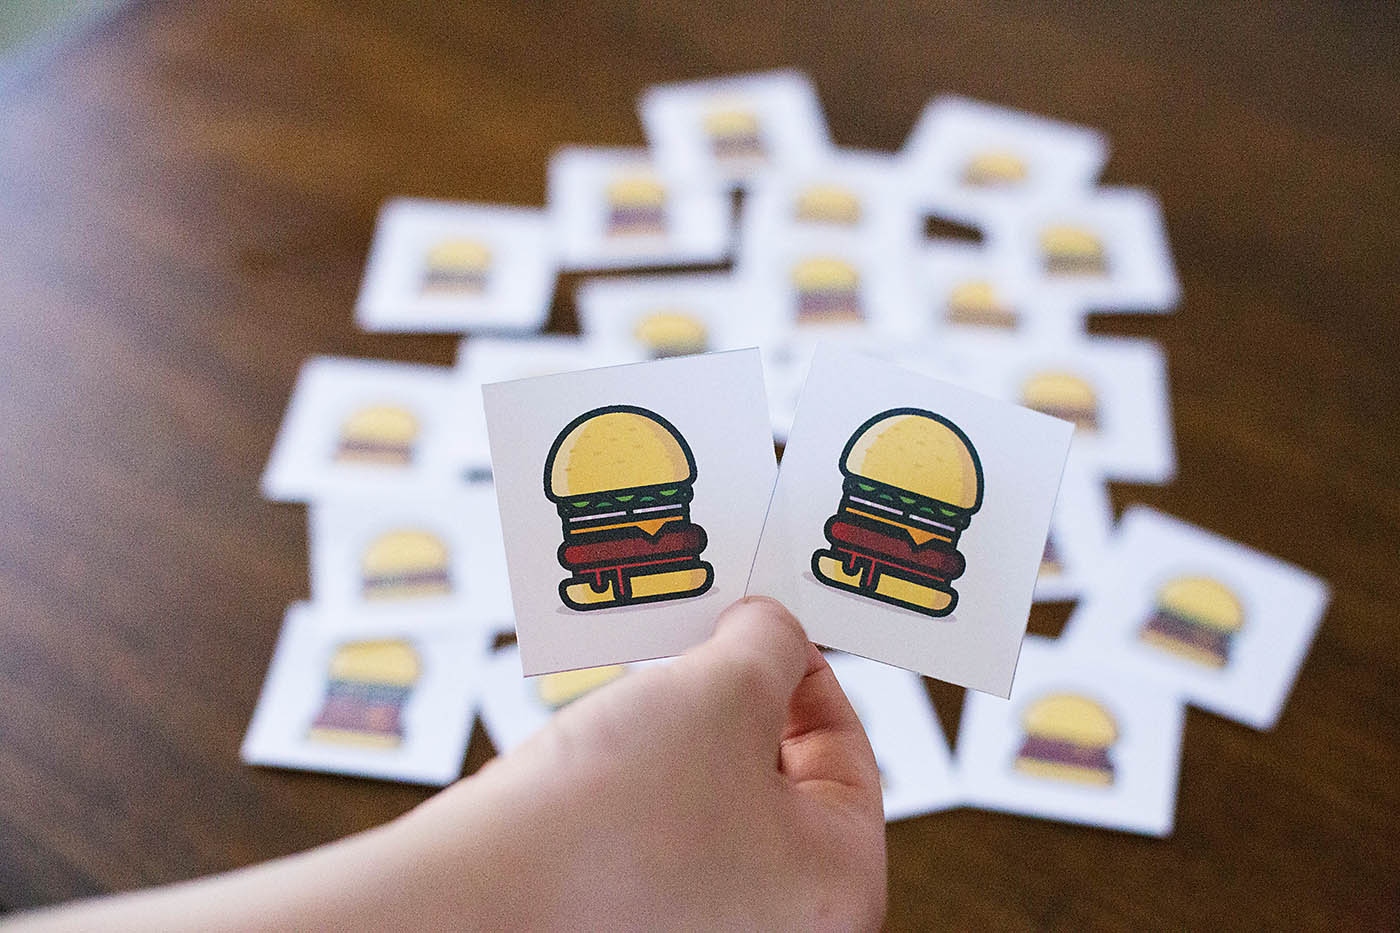 Celebrate National Hamburger Day with a fun hamburger printable game and Culver's